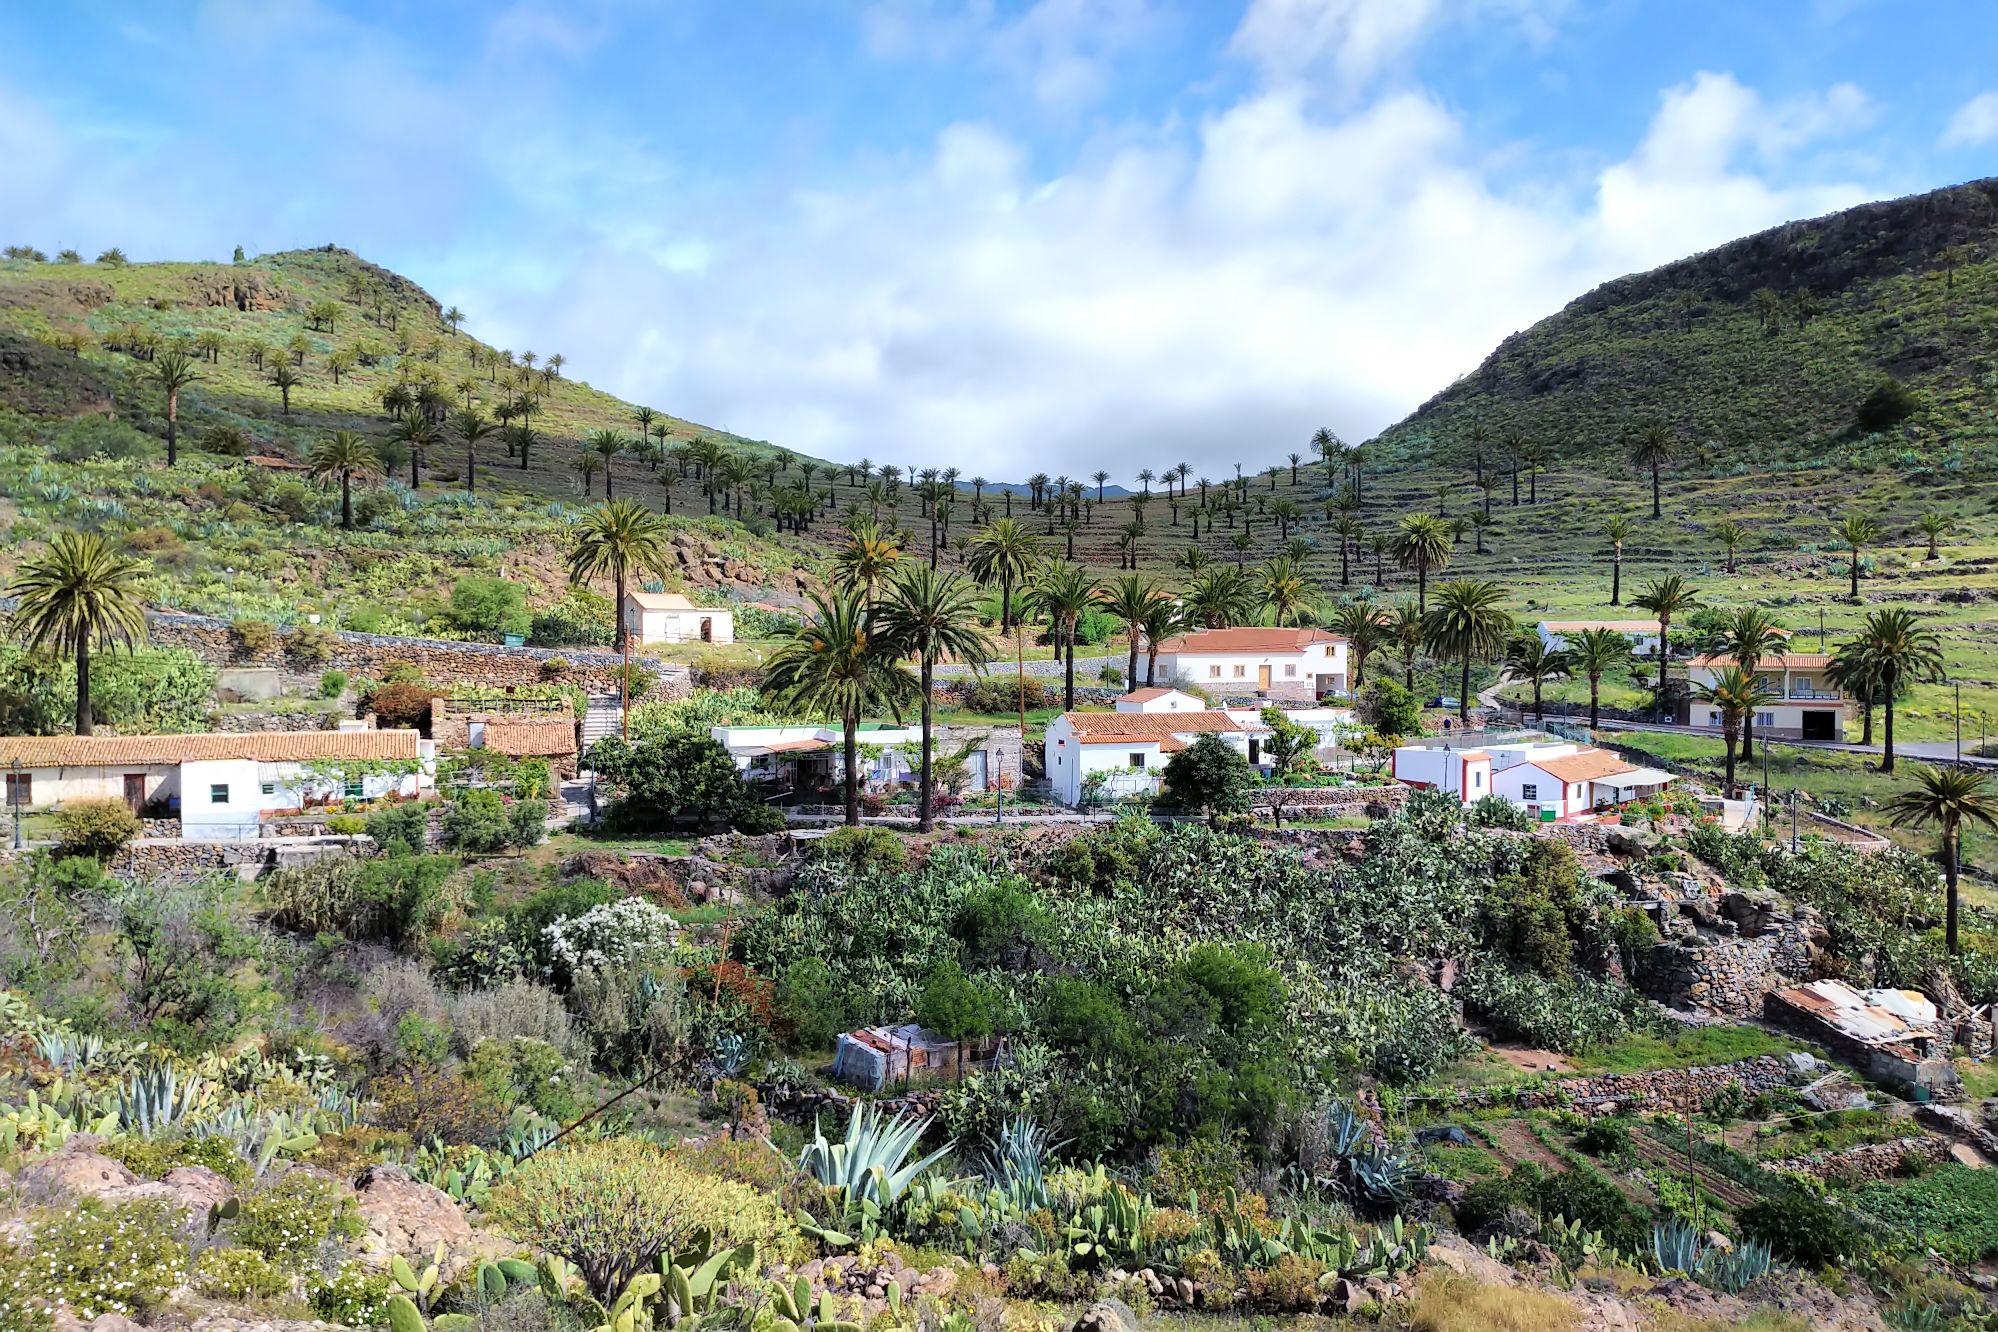 Tagra La Gomera.jpg